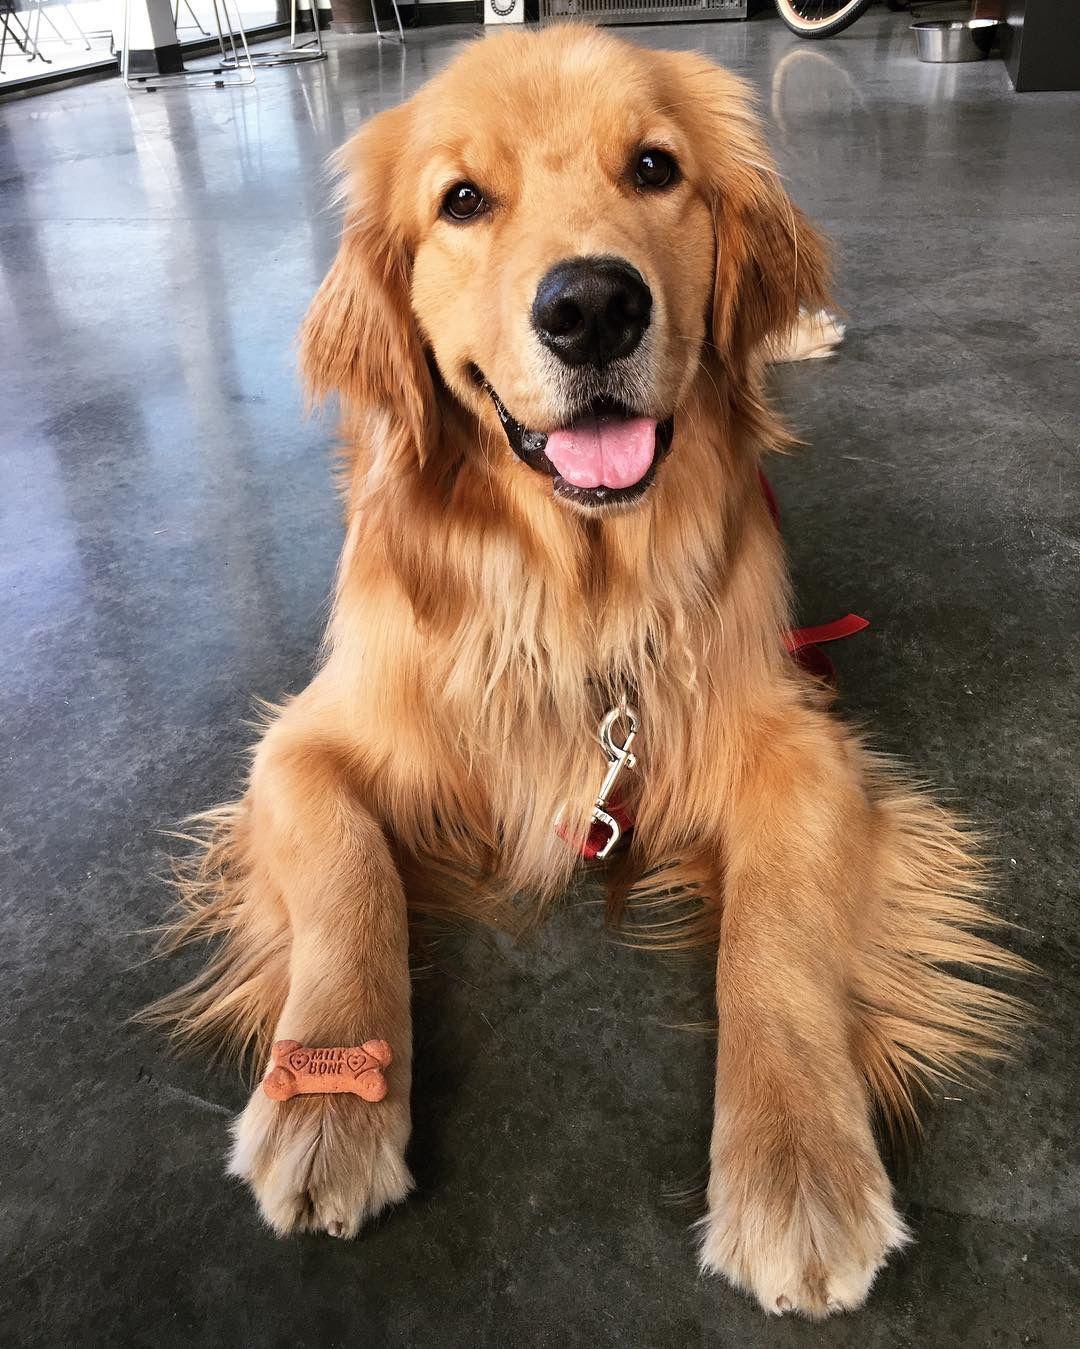 Pinterest Catherinesullivan2017 Dogs Happy Dogs Dog Love